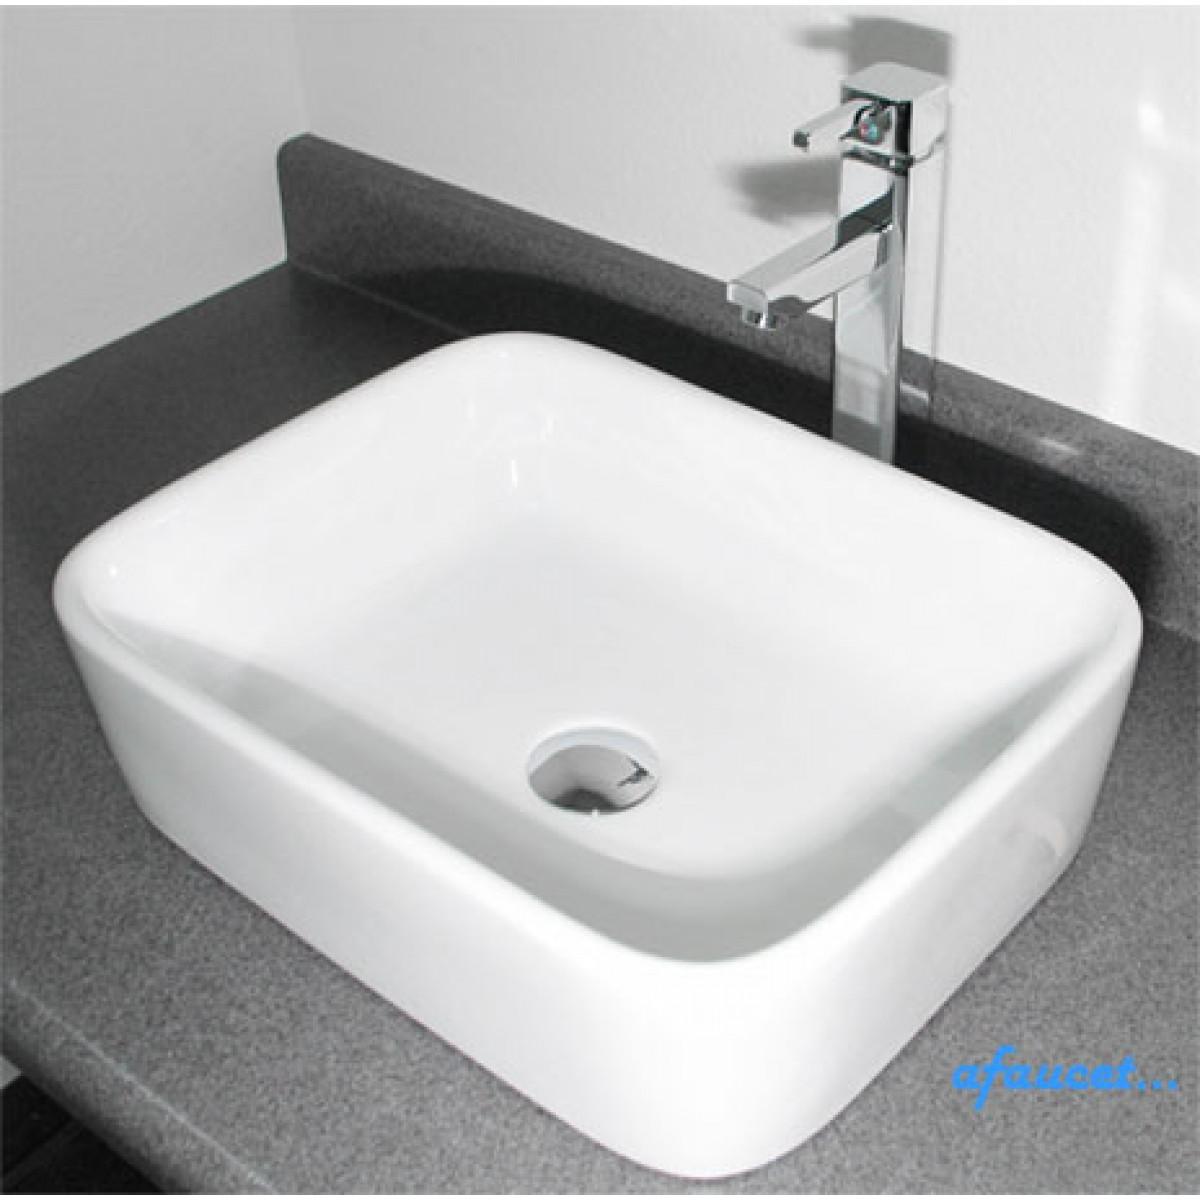 Rectangular White Porcelain Ceramic Countertop Bathroom